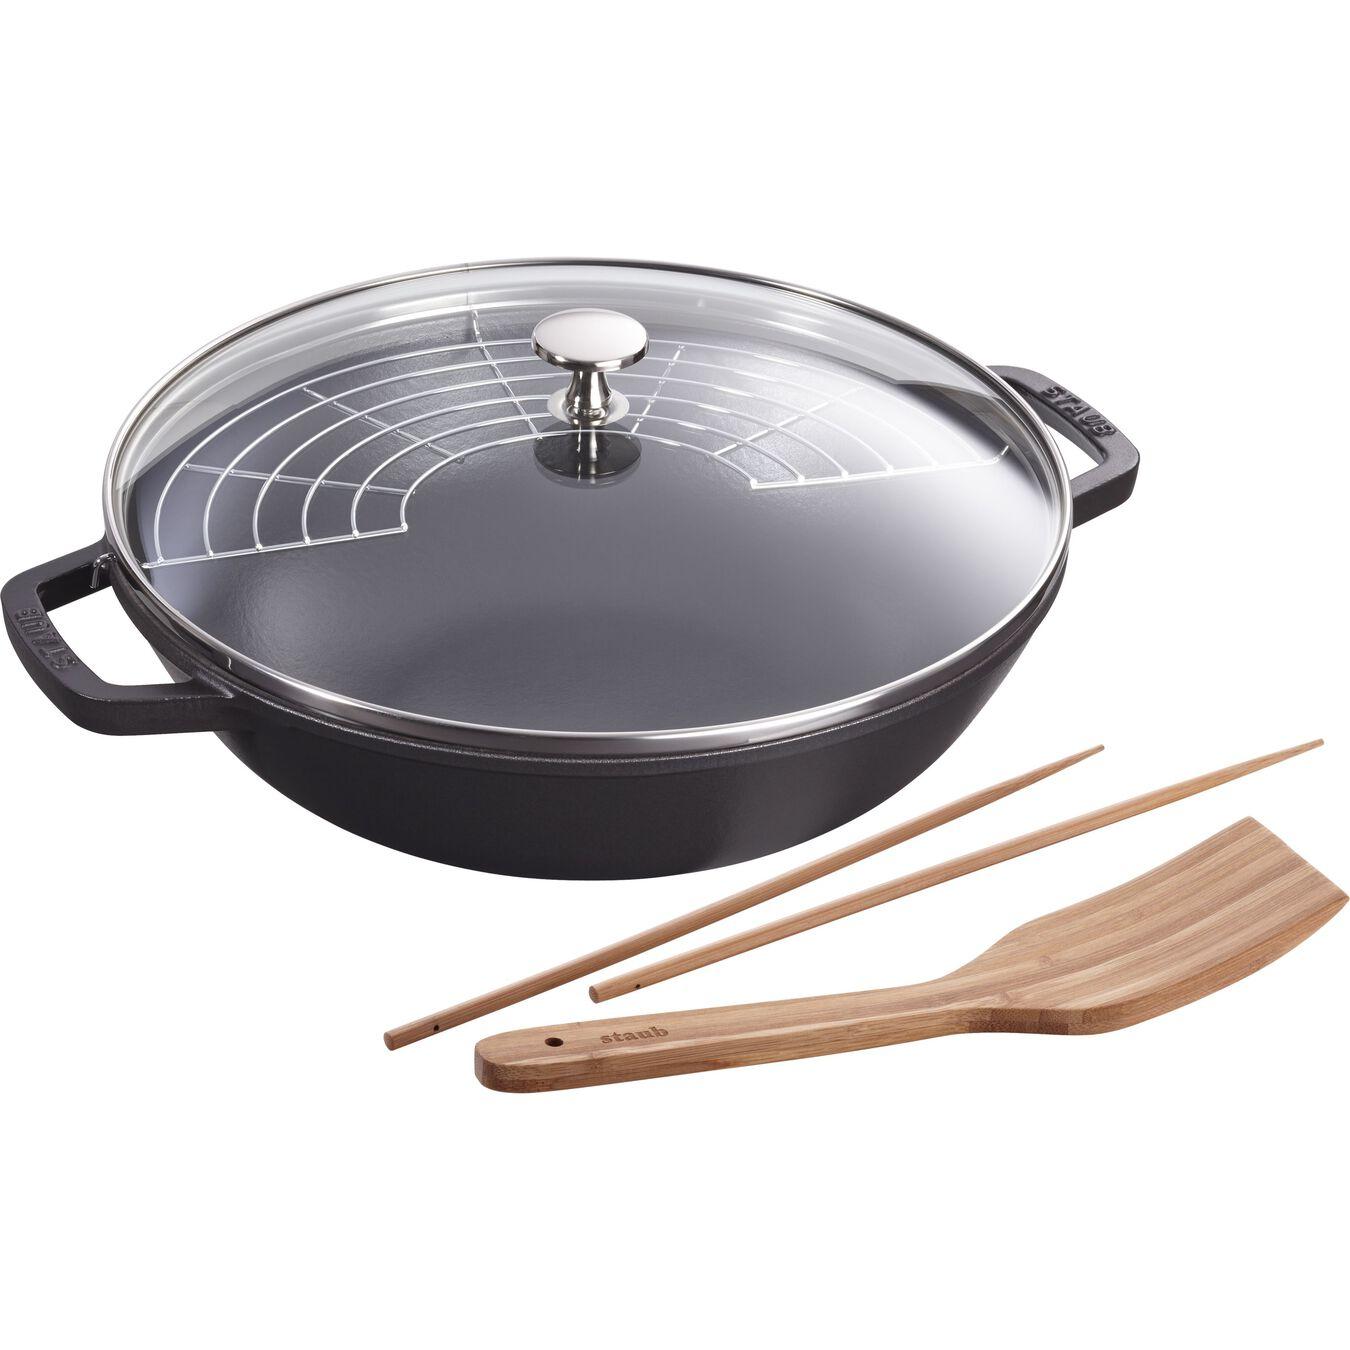 4.5-qt Perfect Pan - Matte Black,,large 2